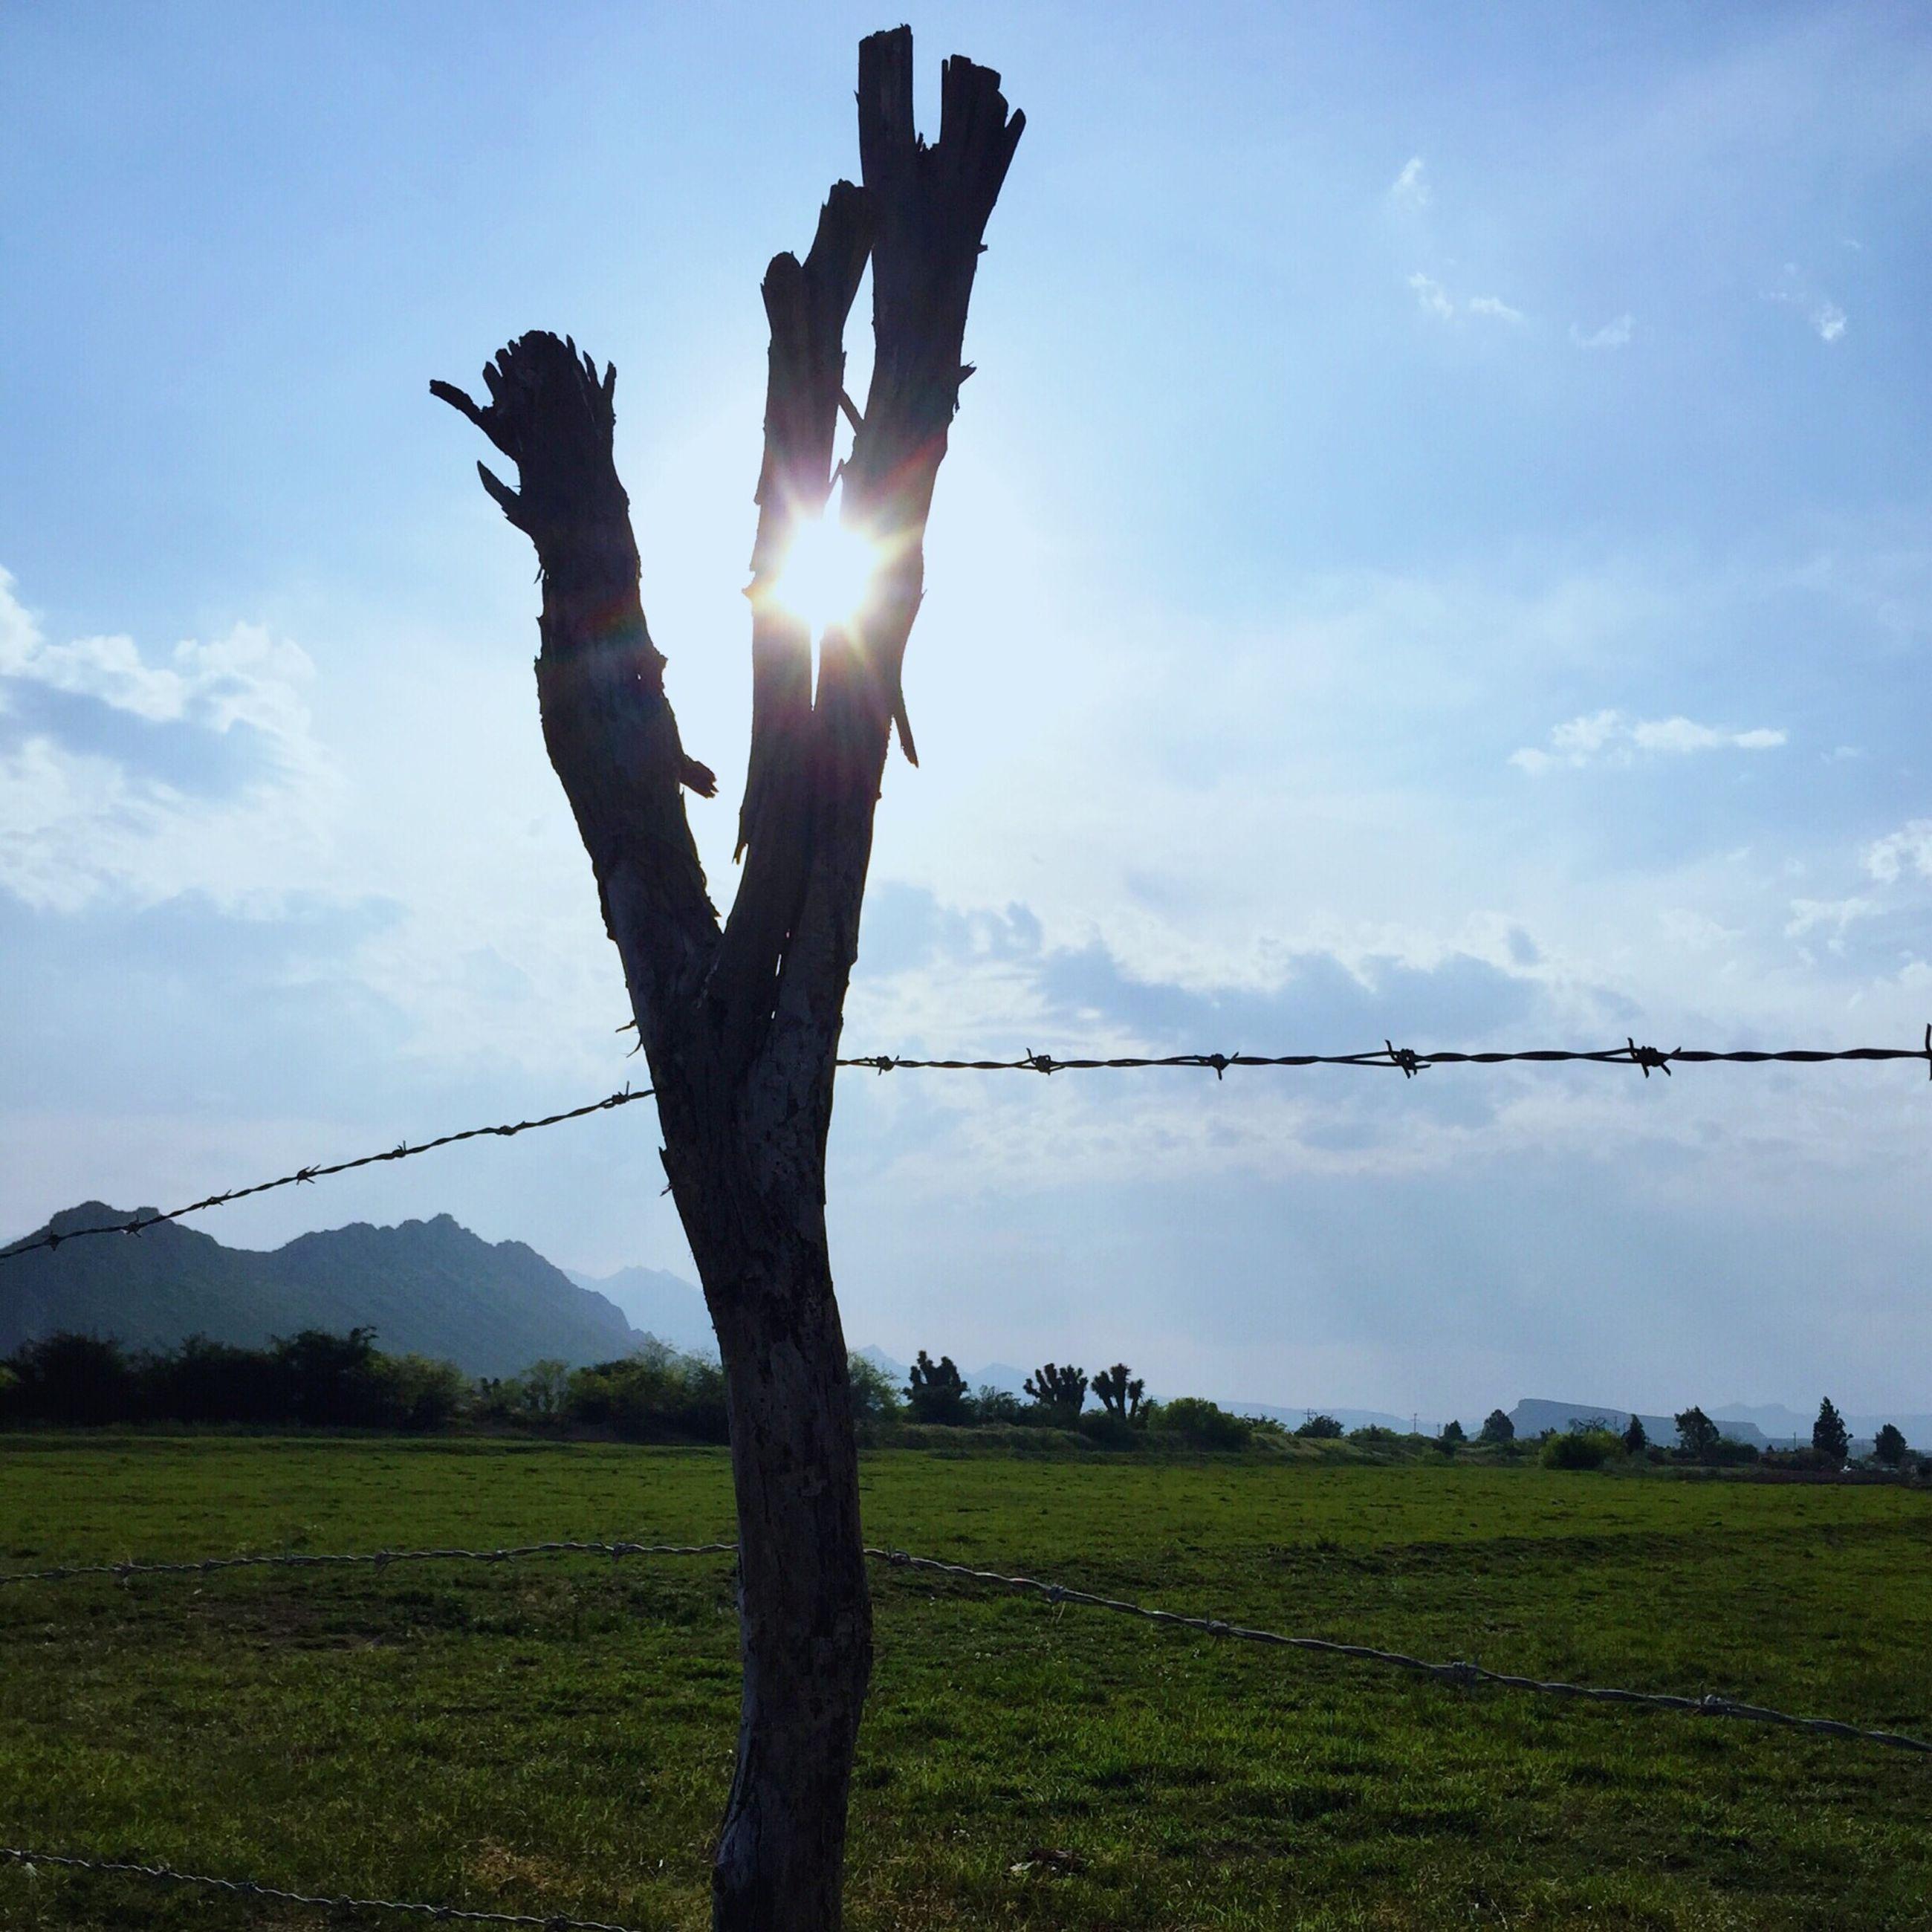 sun, tranquility, sky, sunlight, tranquil scene, sunbeam, field, grass, landscape, nature, beauty in nature, scenics, lens flare, growth, tree, tree trunk, sunny, grassy, non-urban scene, blue